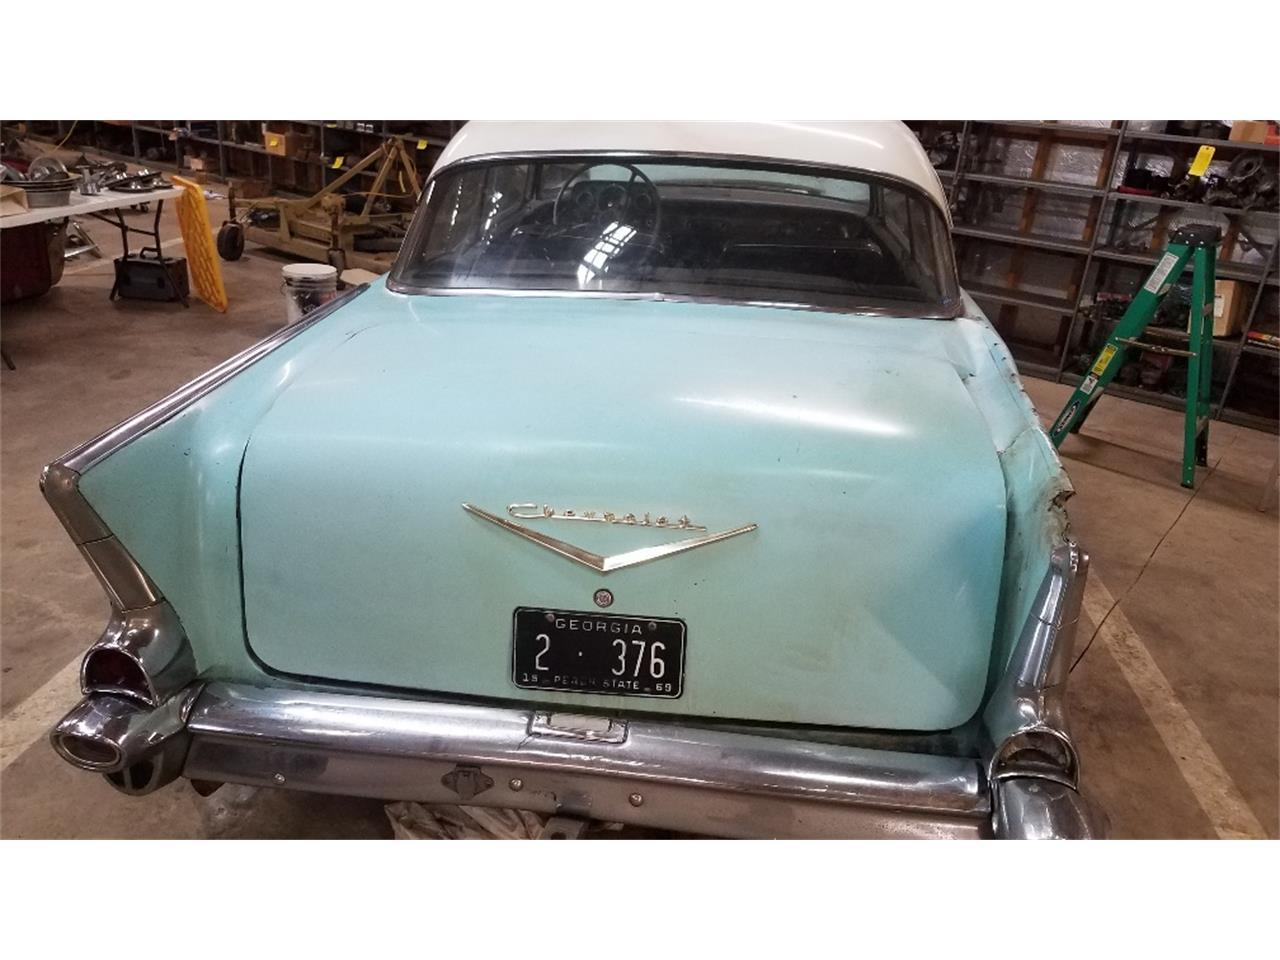 1957 Chevrolet Bel Air (CC-1275267) for sale in Suwanee, Georgia